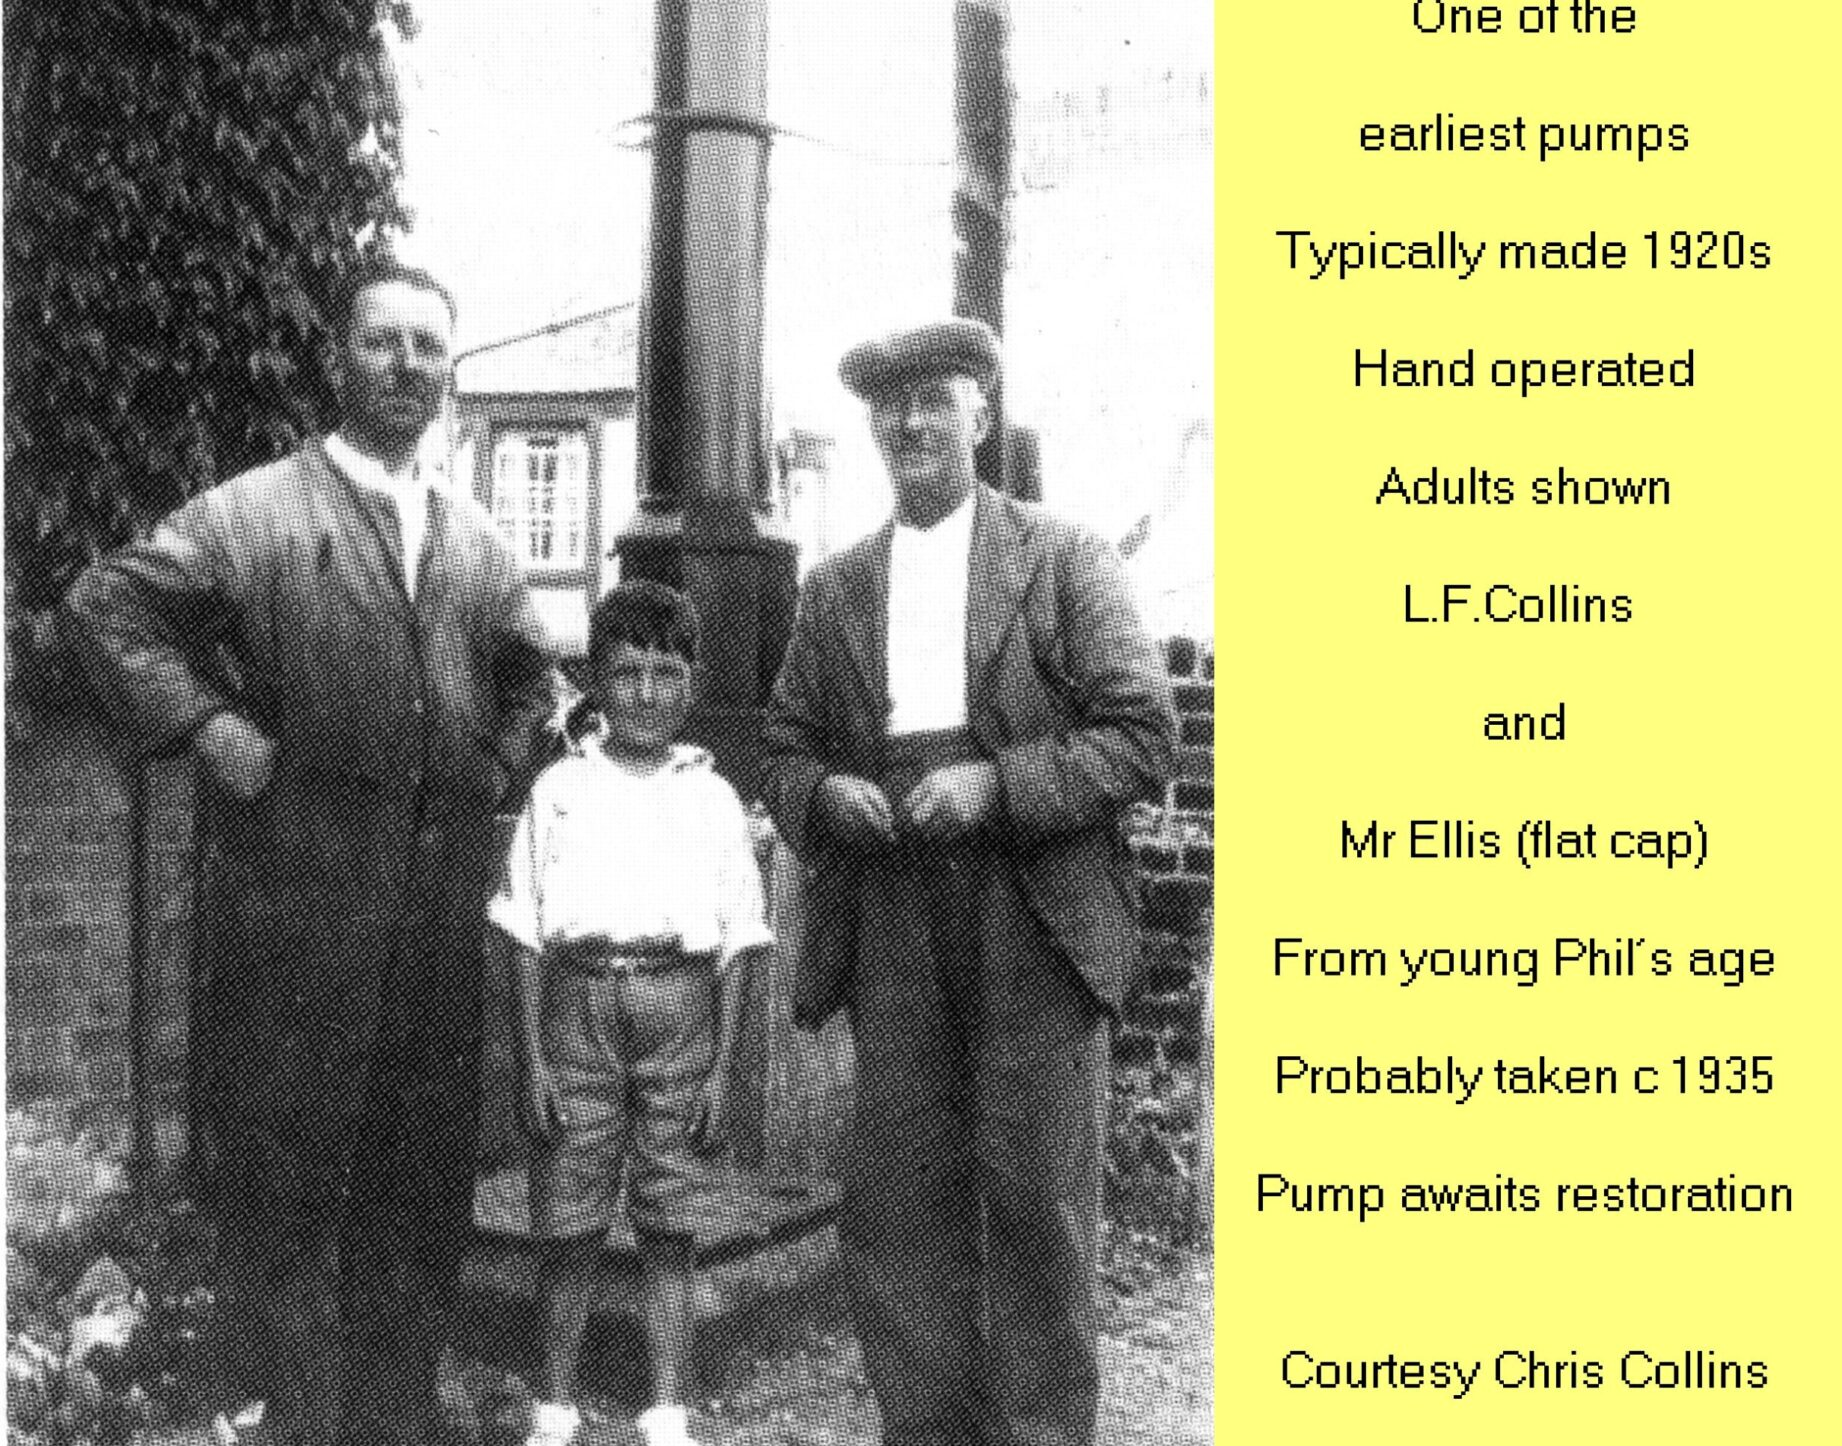 WESTBOURNE HISTORY PHOTO, COLLINS, GARAGE, PETROL, PUMP